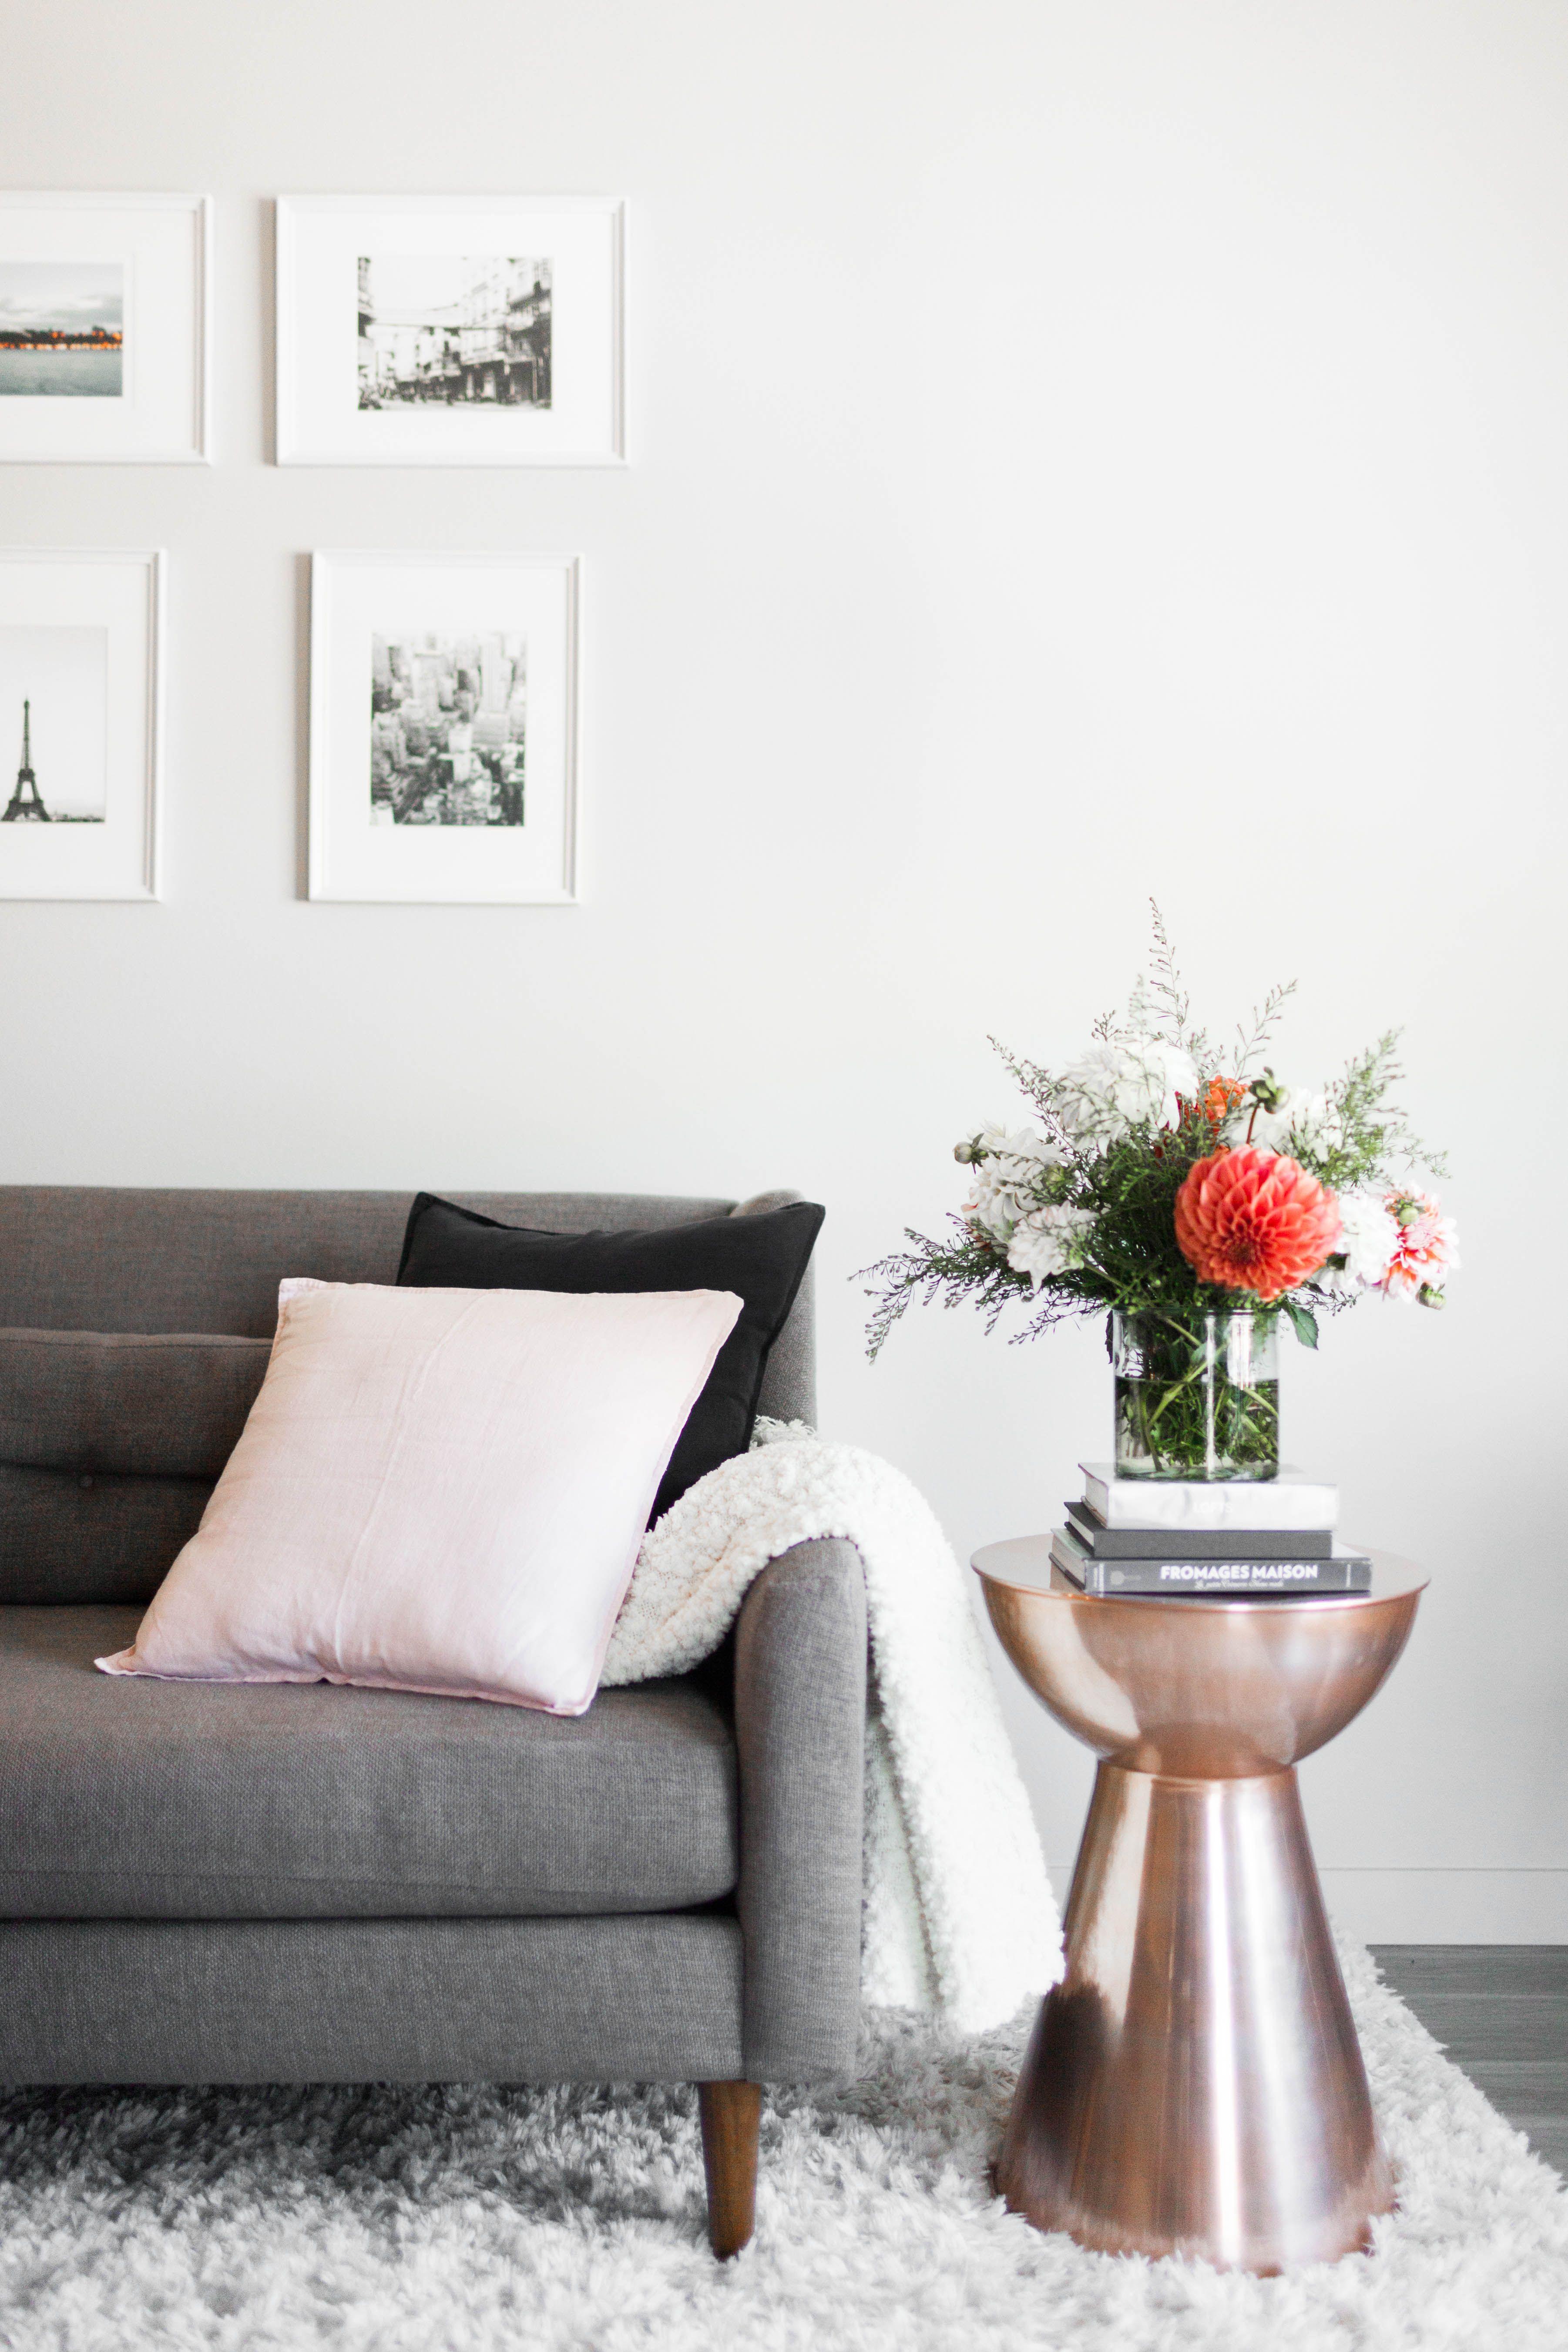 West Elm Crosby Sofa + Copper Side Table + Blush